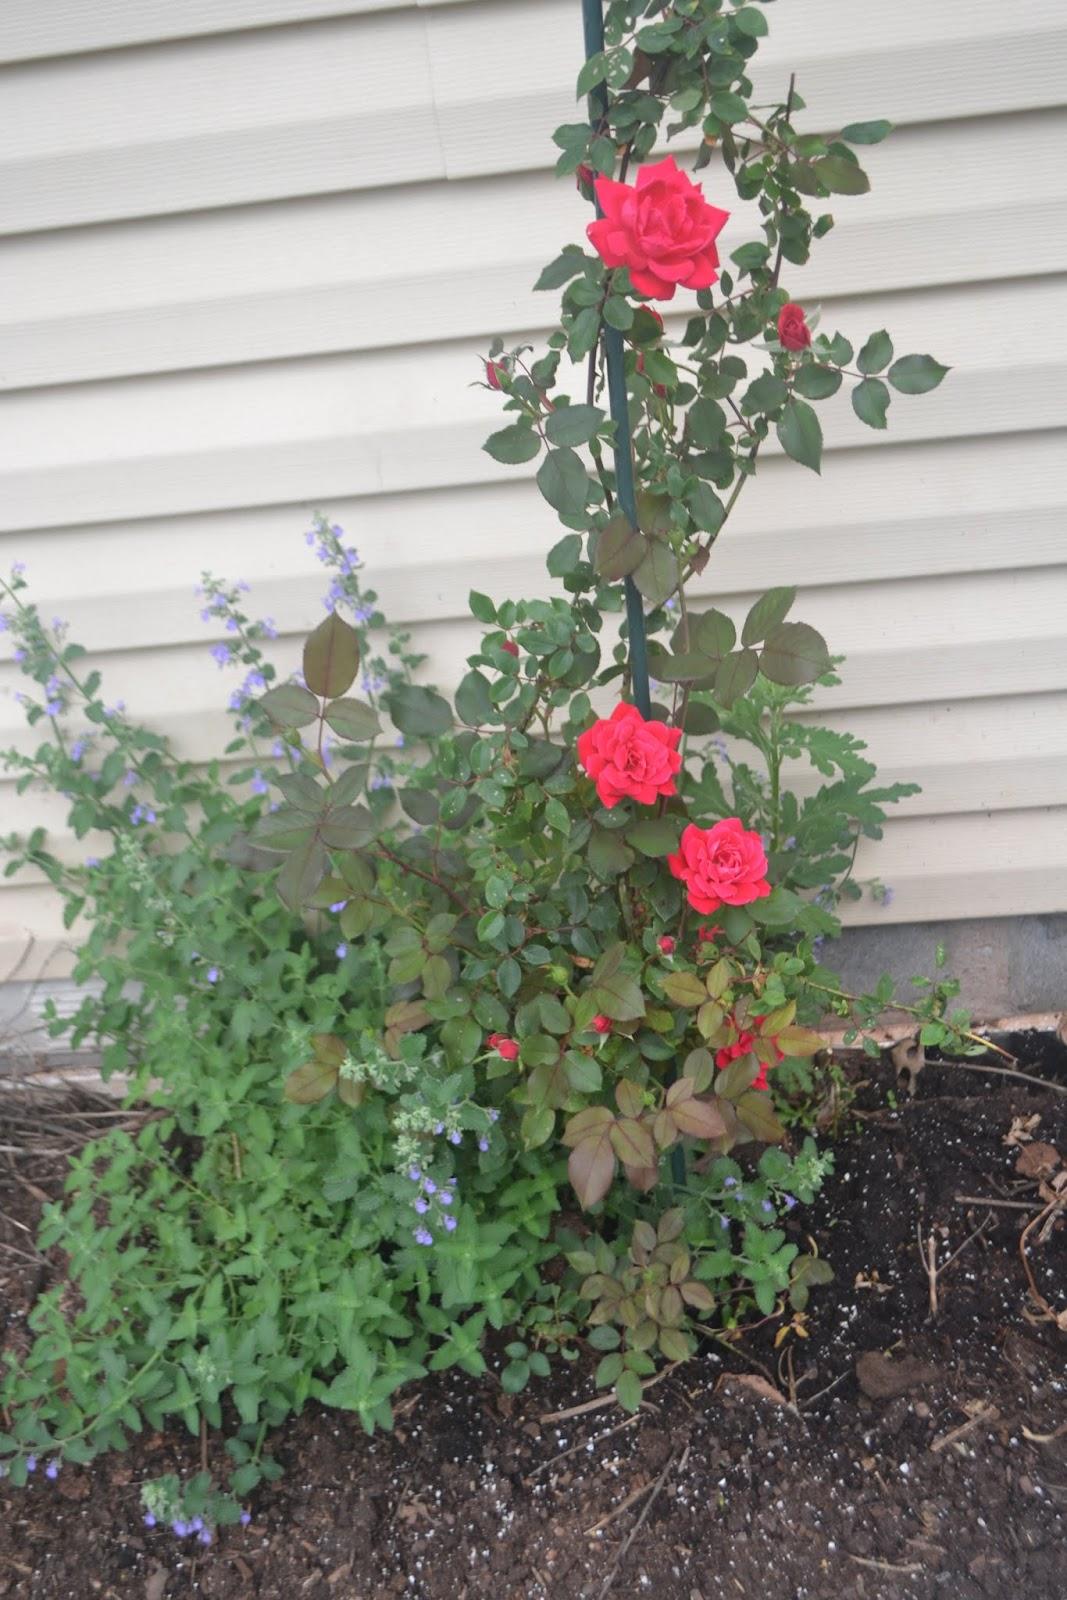 Shireesha S Blogspot 2017 Backyard Plants 1